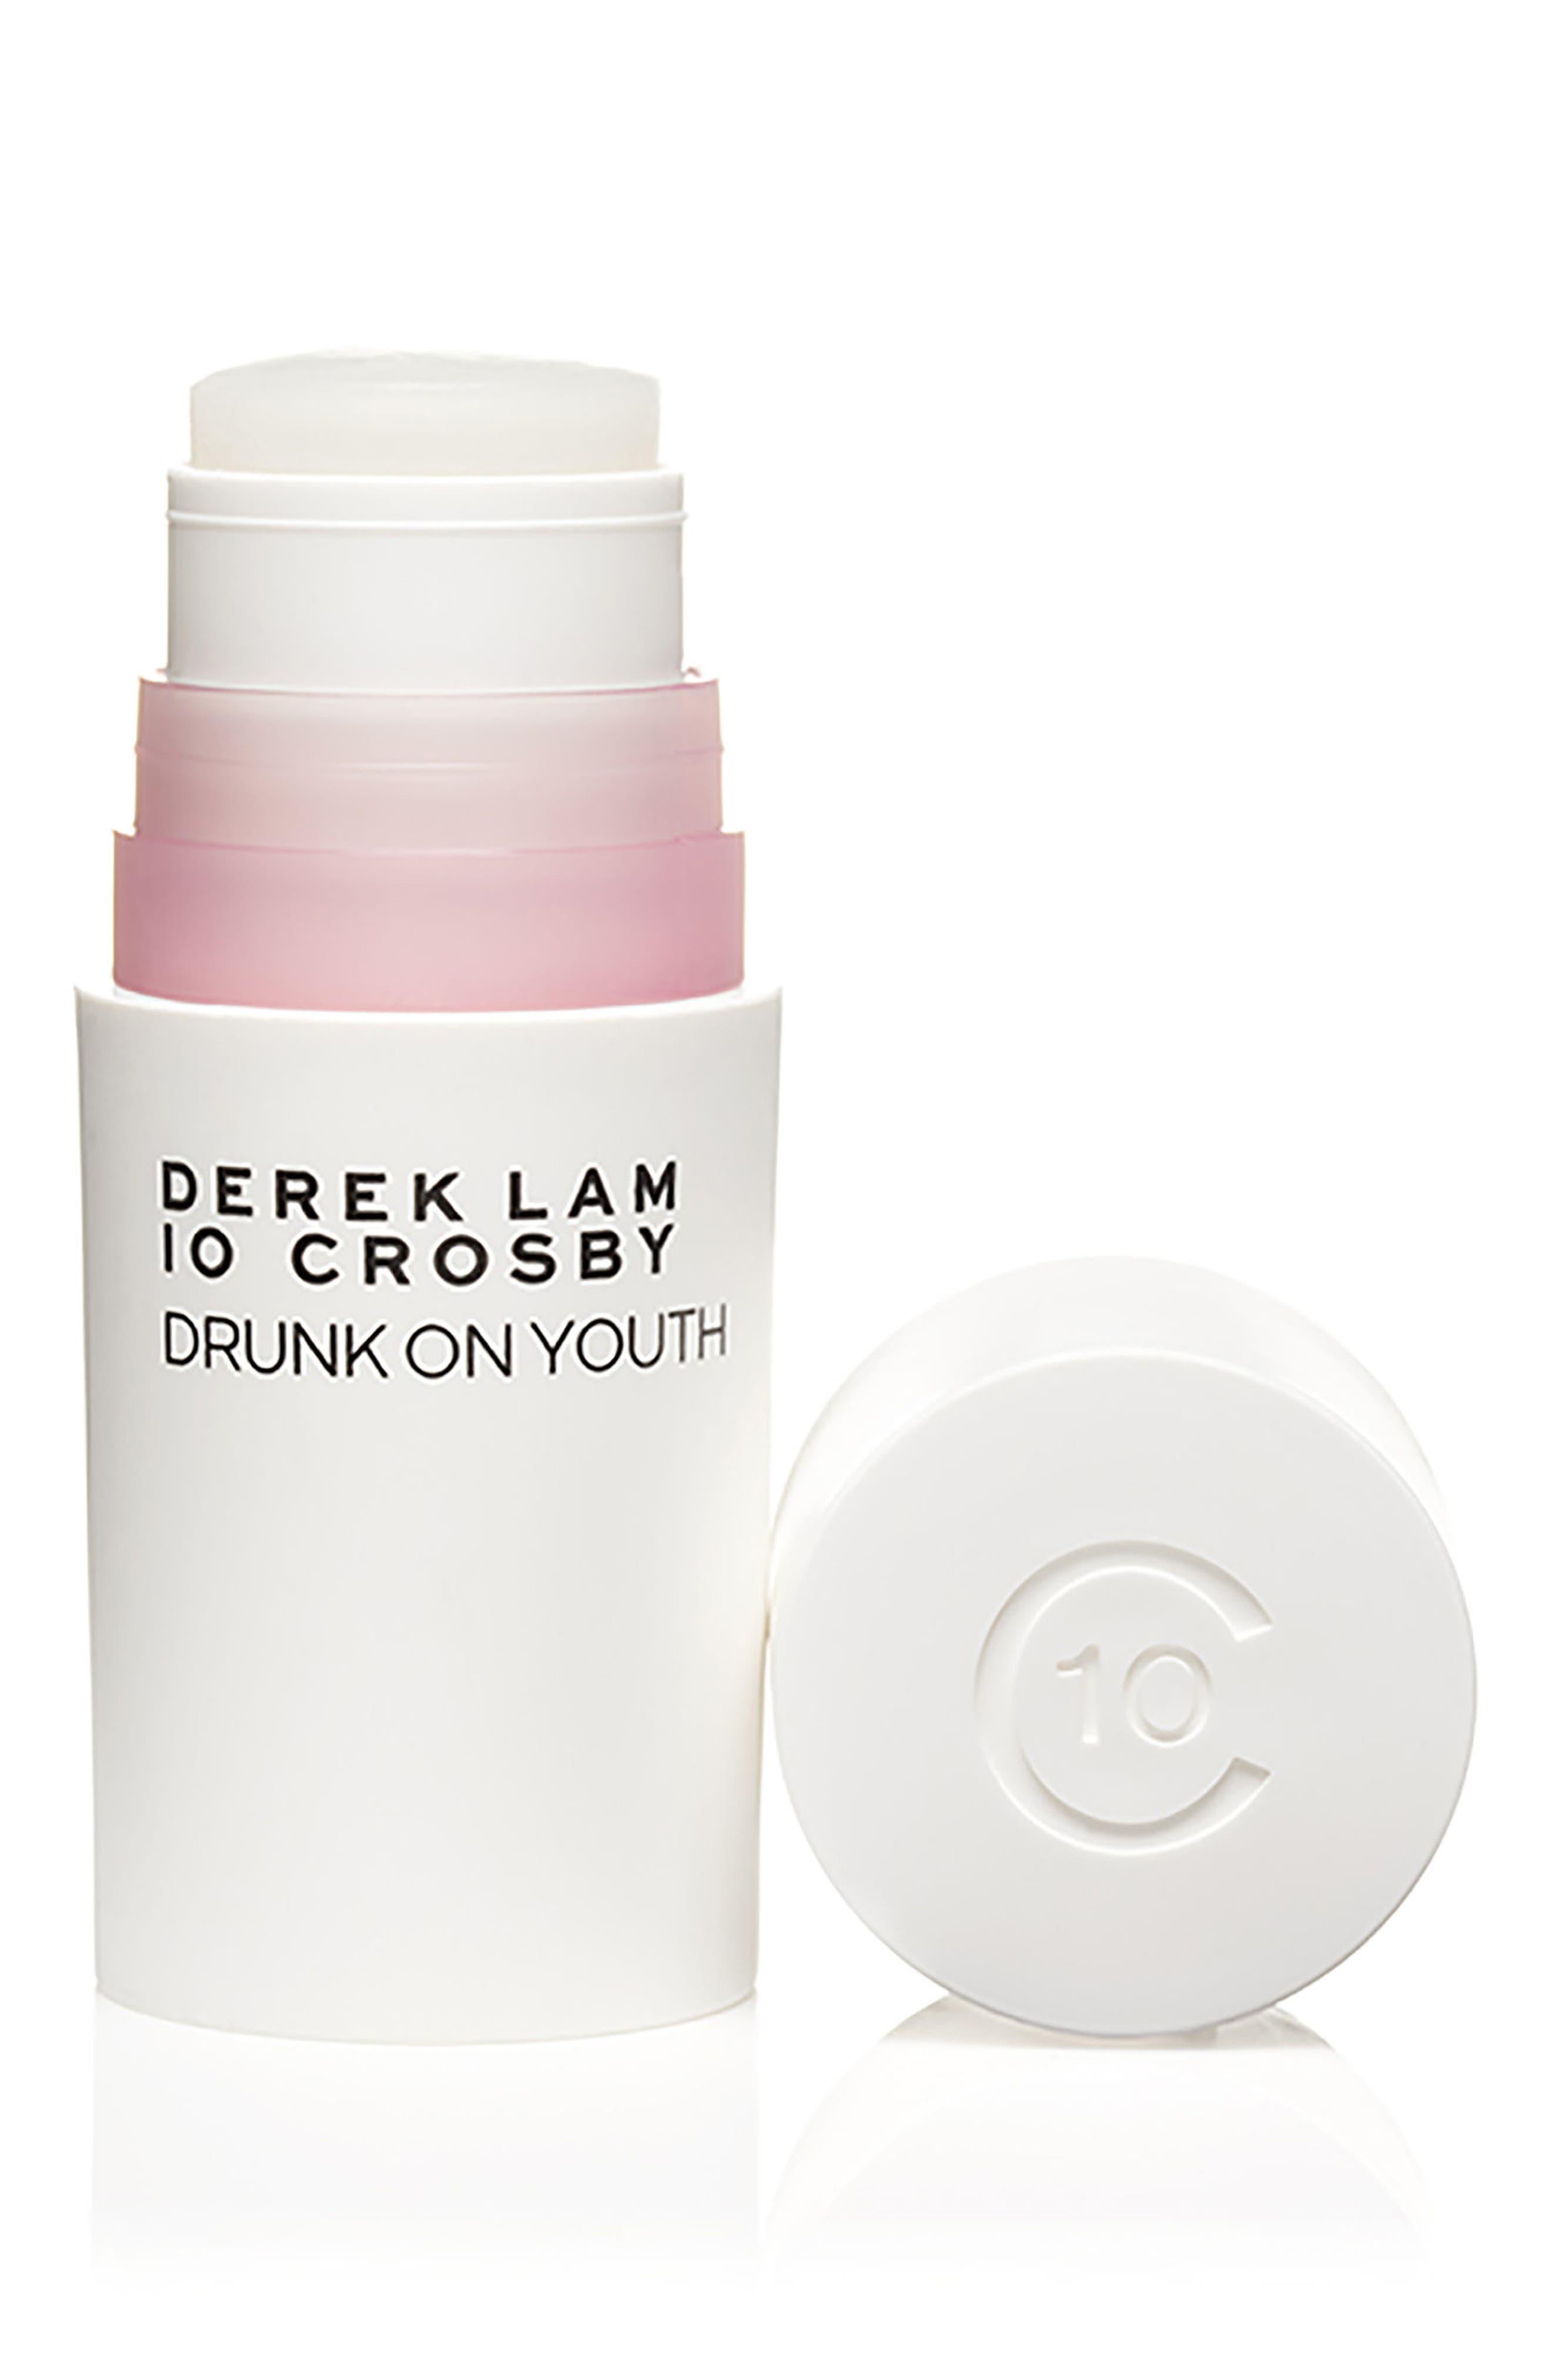 Main Image - Derek Lam 10 Crosby Drunk on Youth Parfum Stick